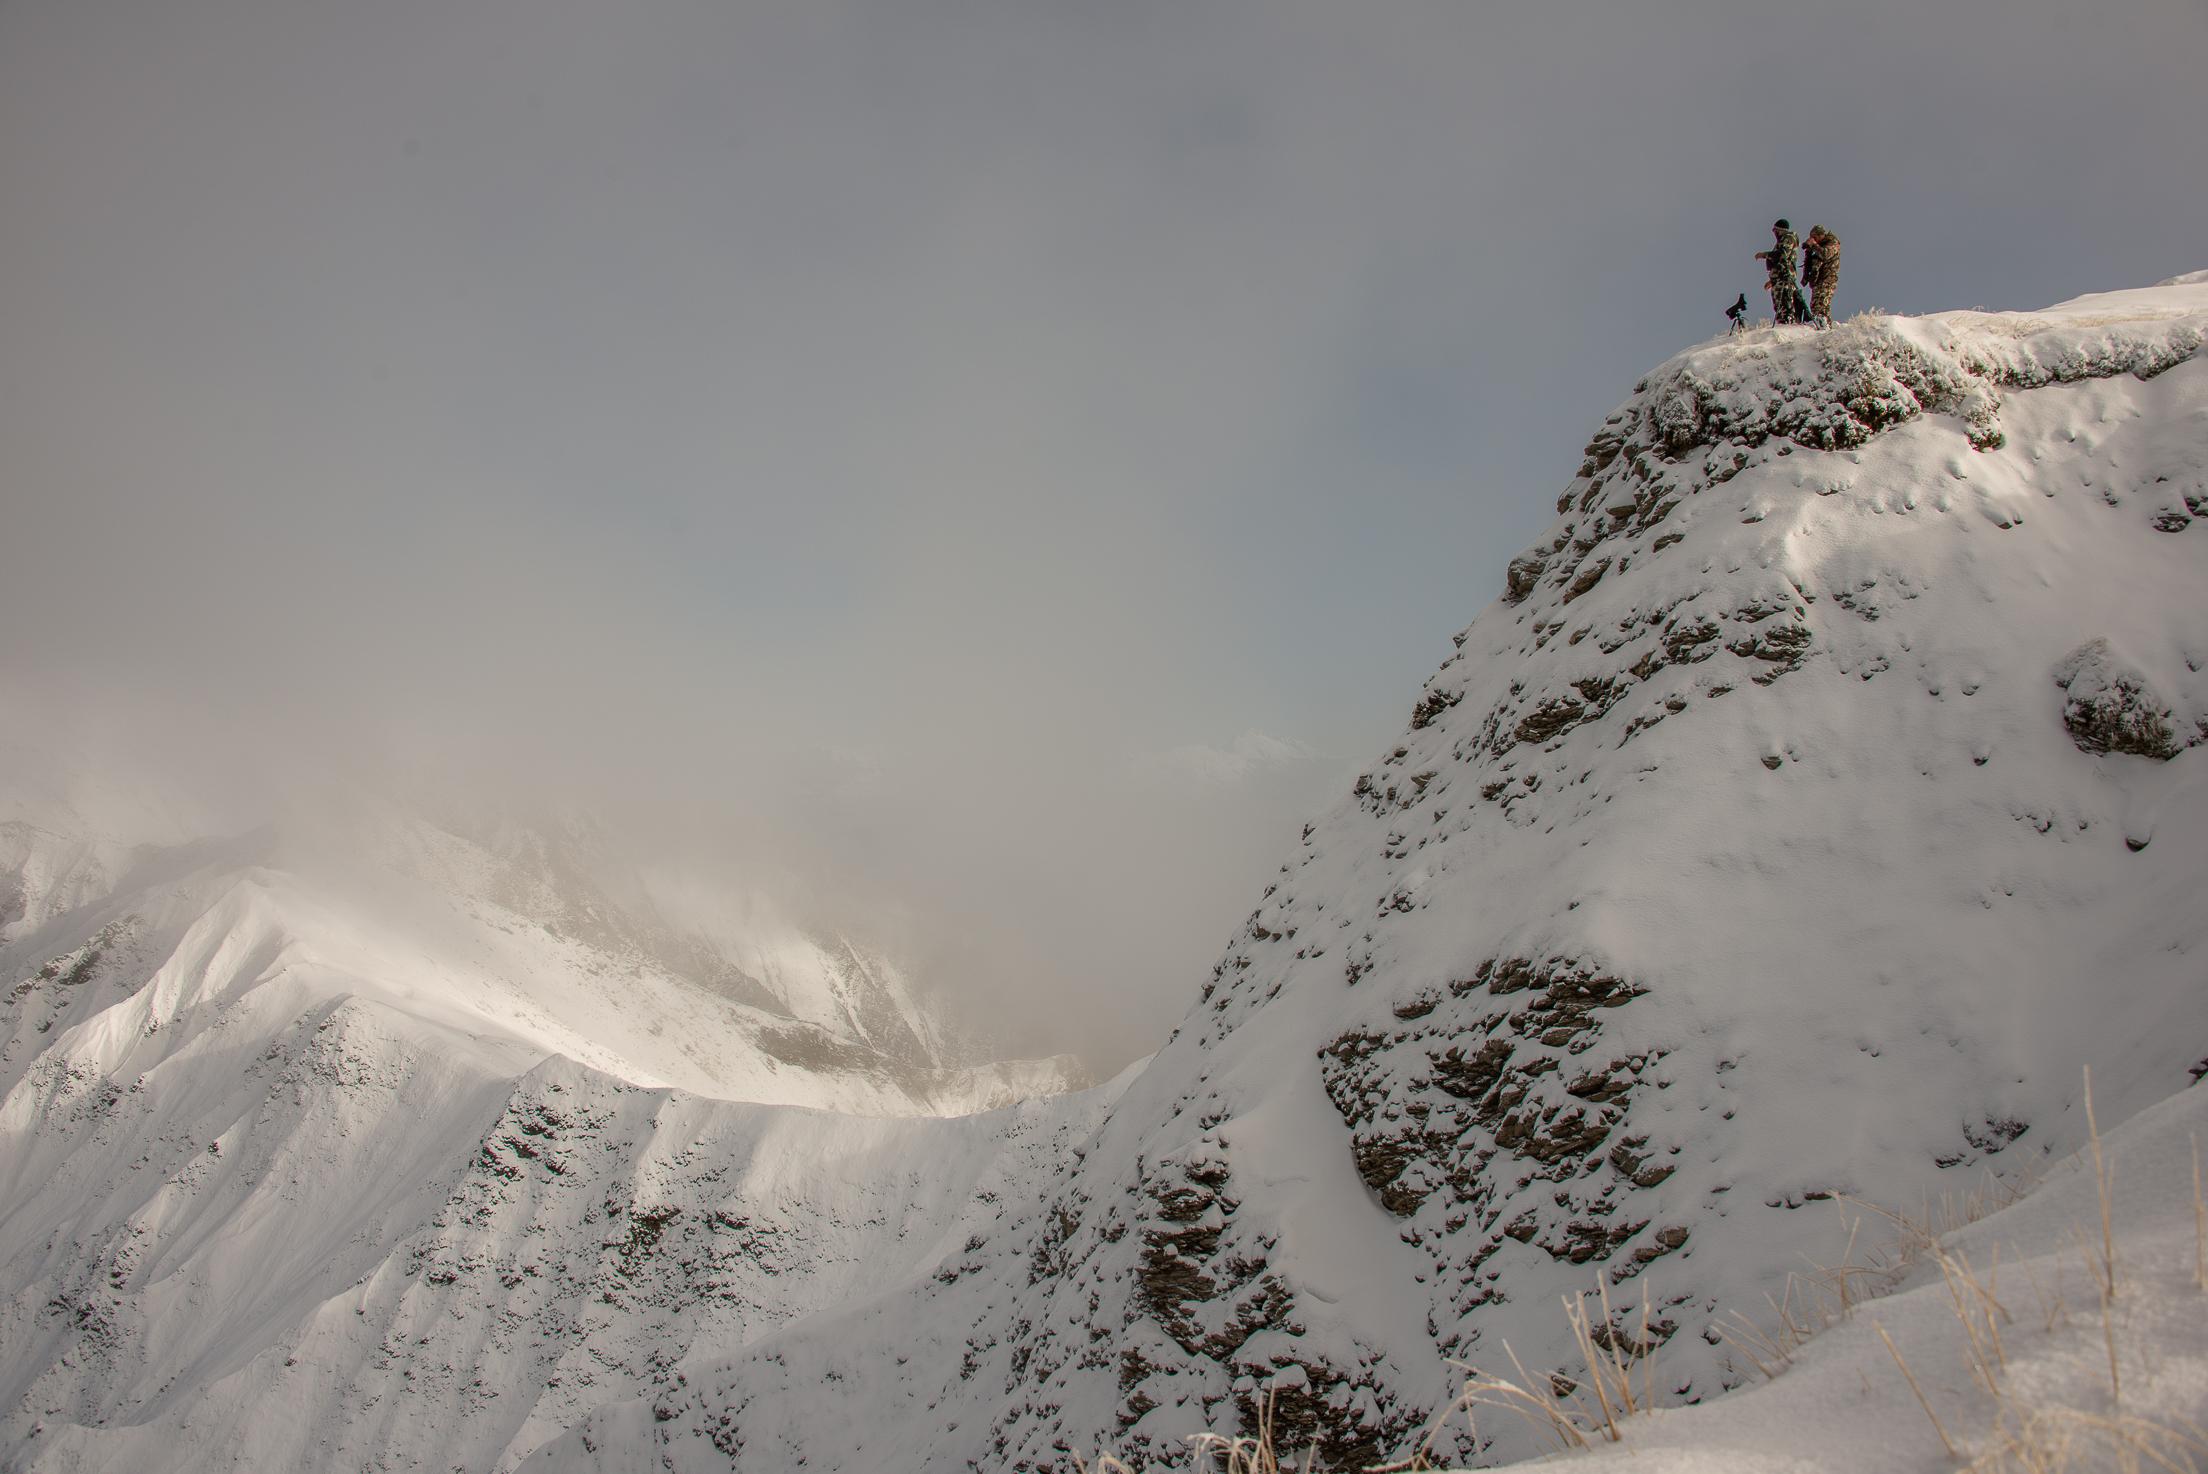 tahr hunters standing on ridge Image @ Sean Powell